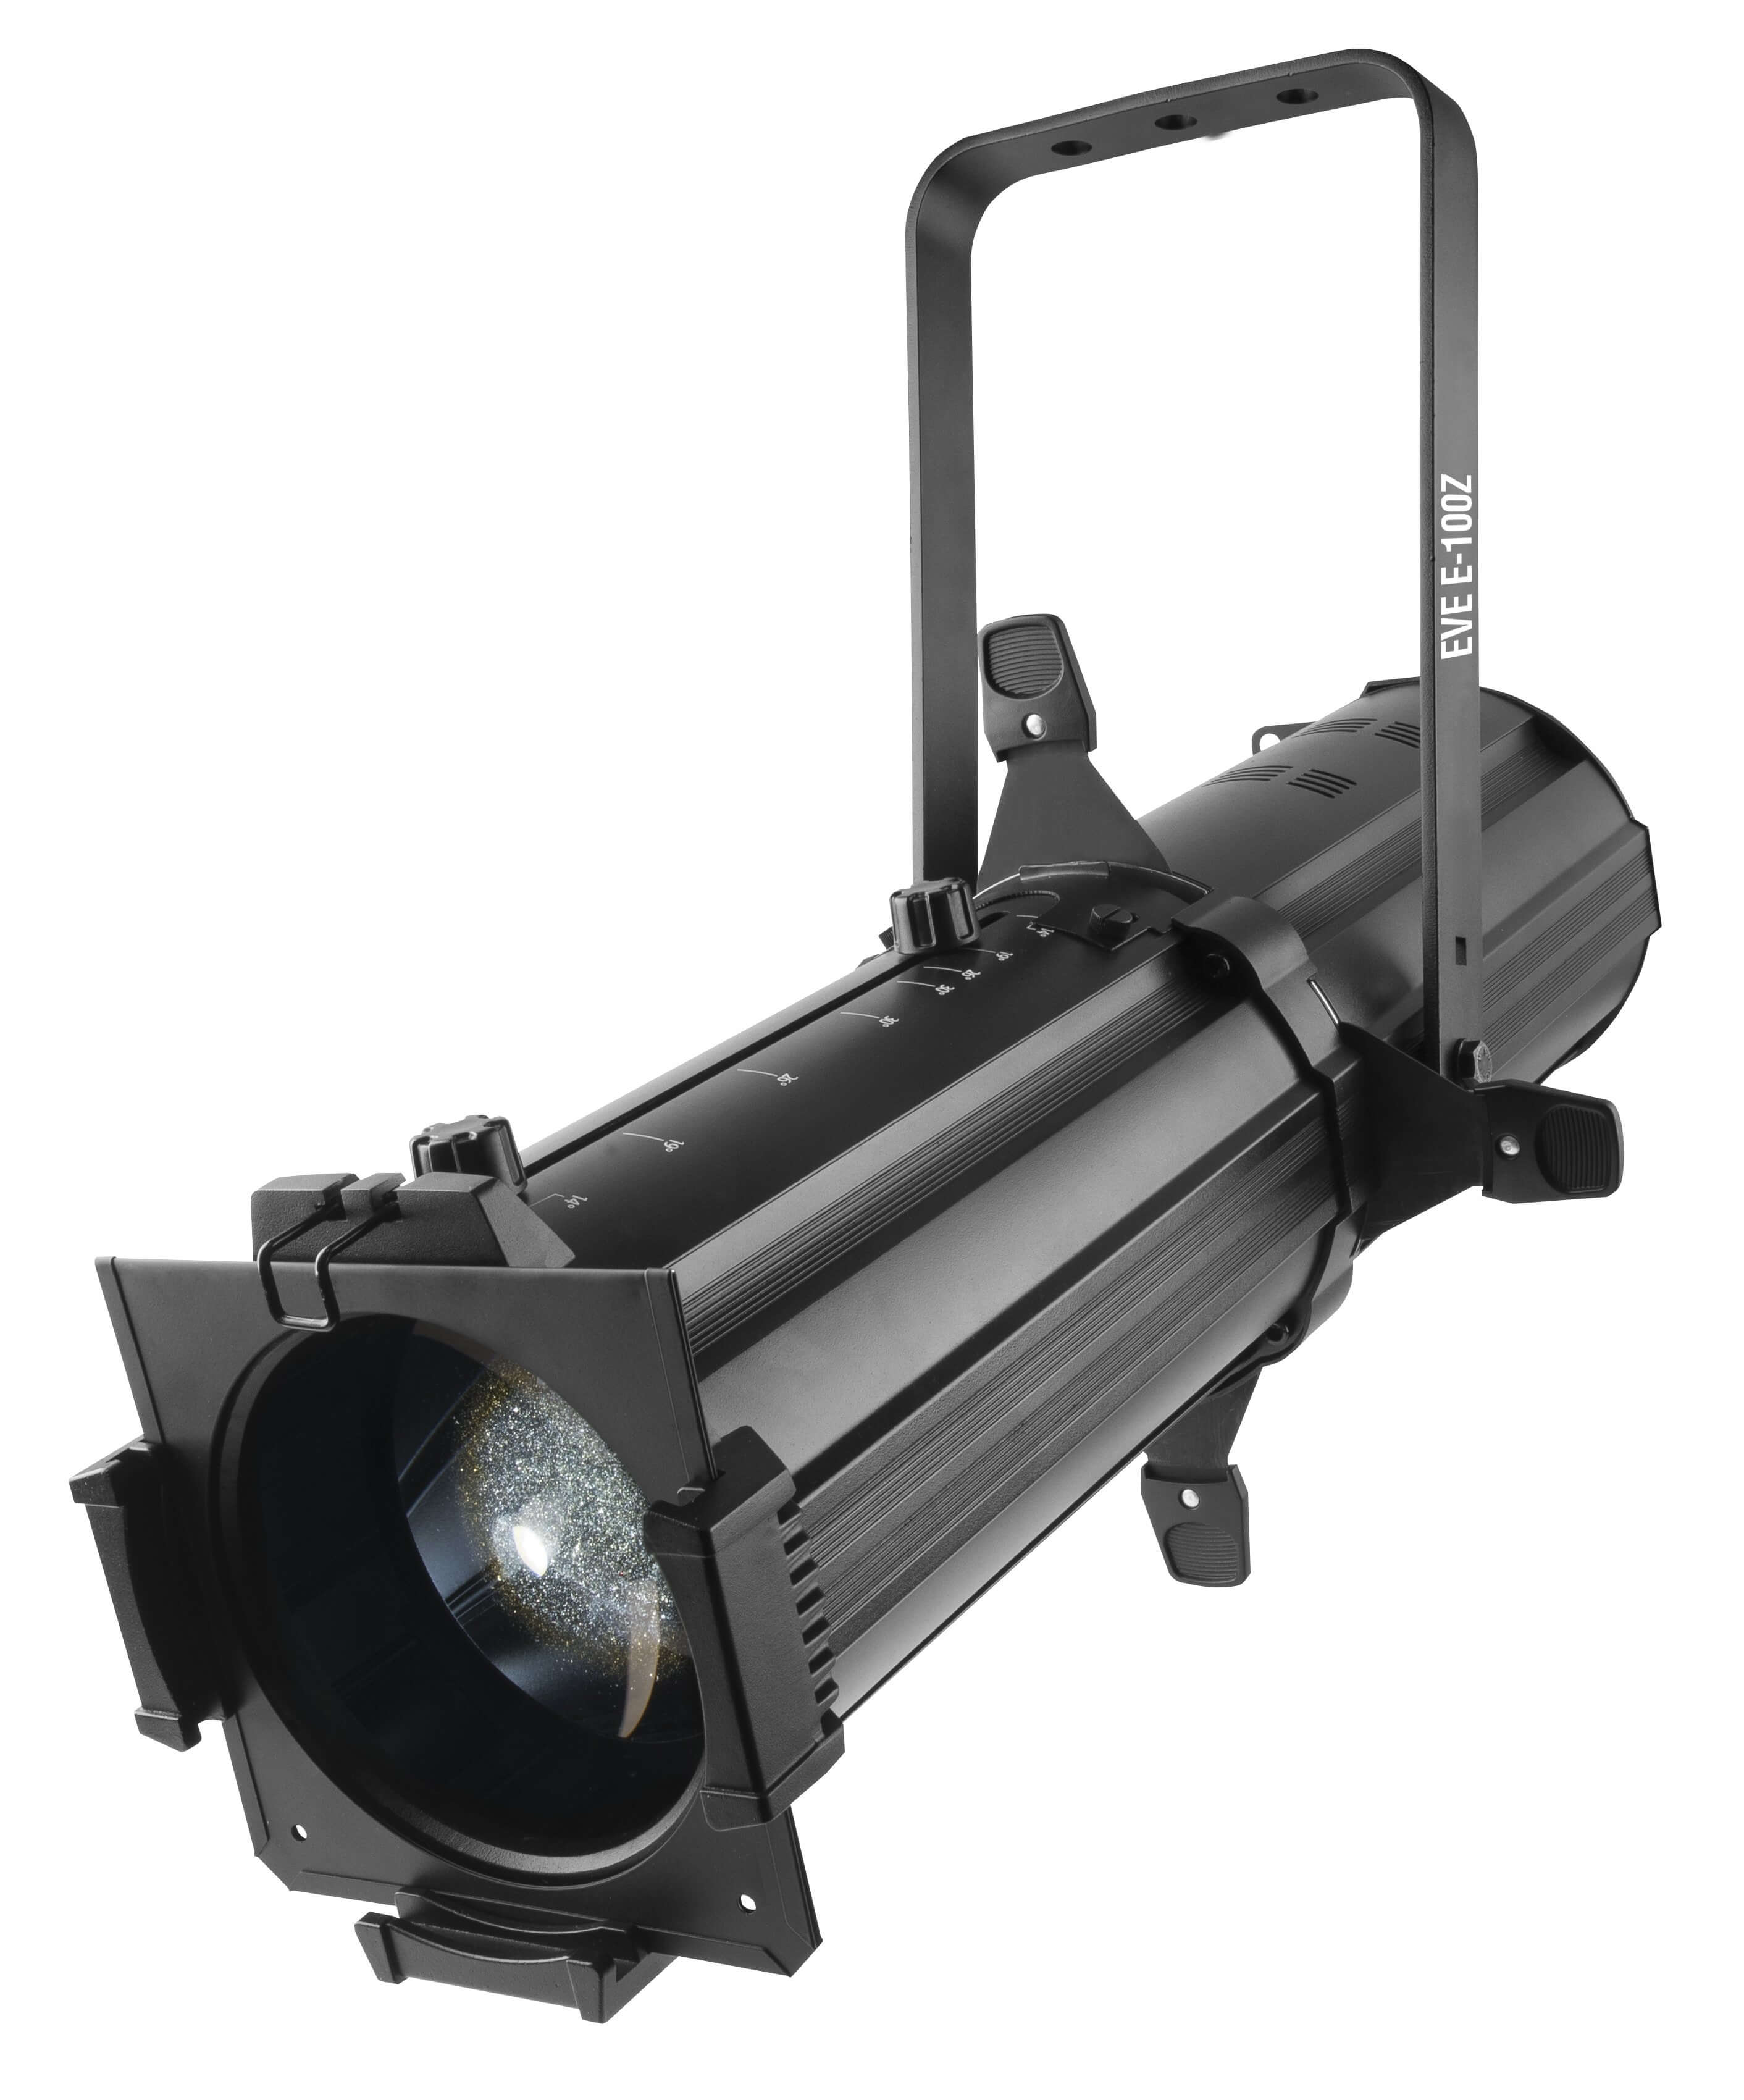 Chauvet EVE E-100Z 100W LED Profile Spot